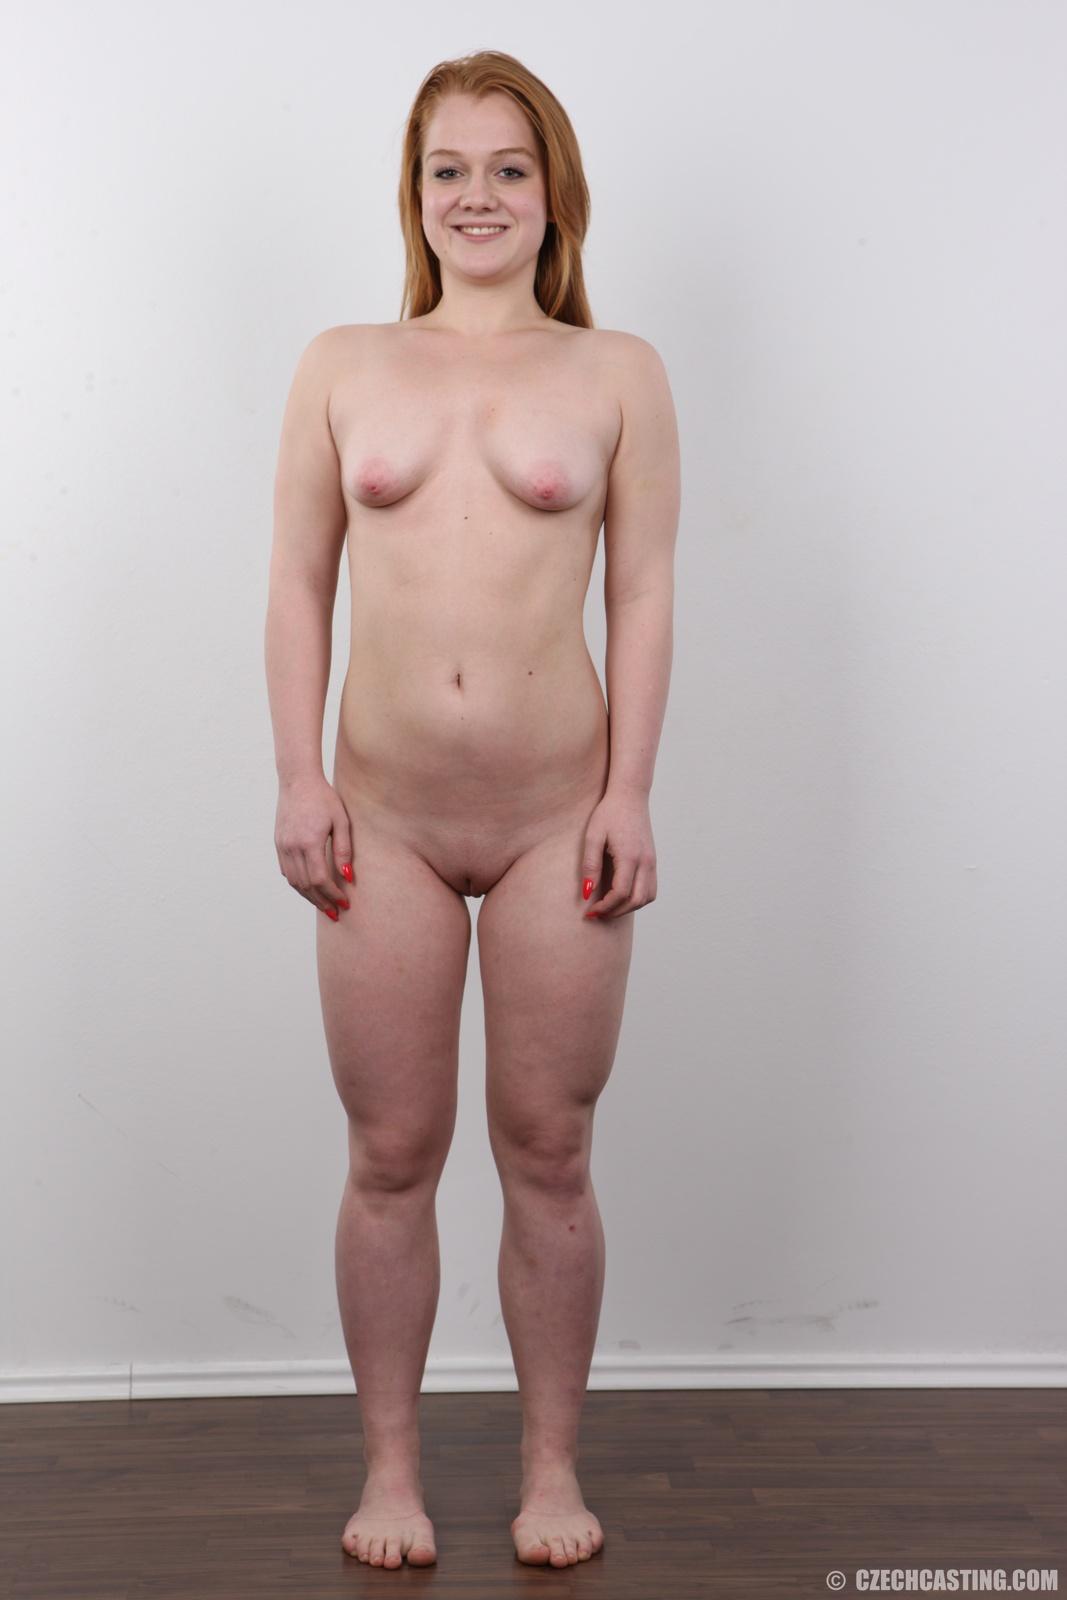 wpid-18-year-old-eliska-casting-photos25.jpg